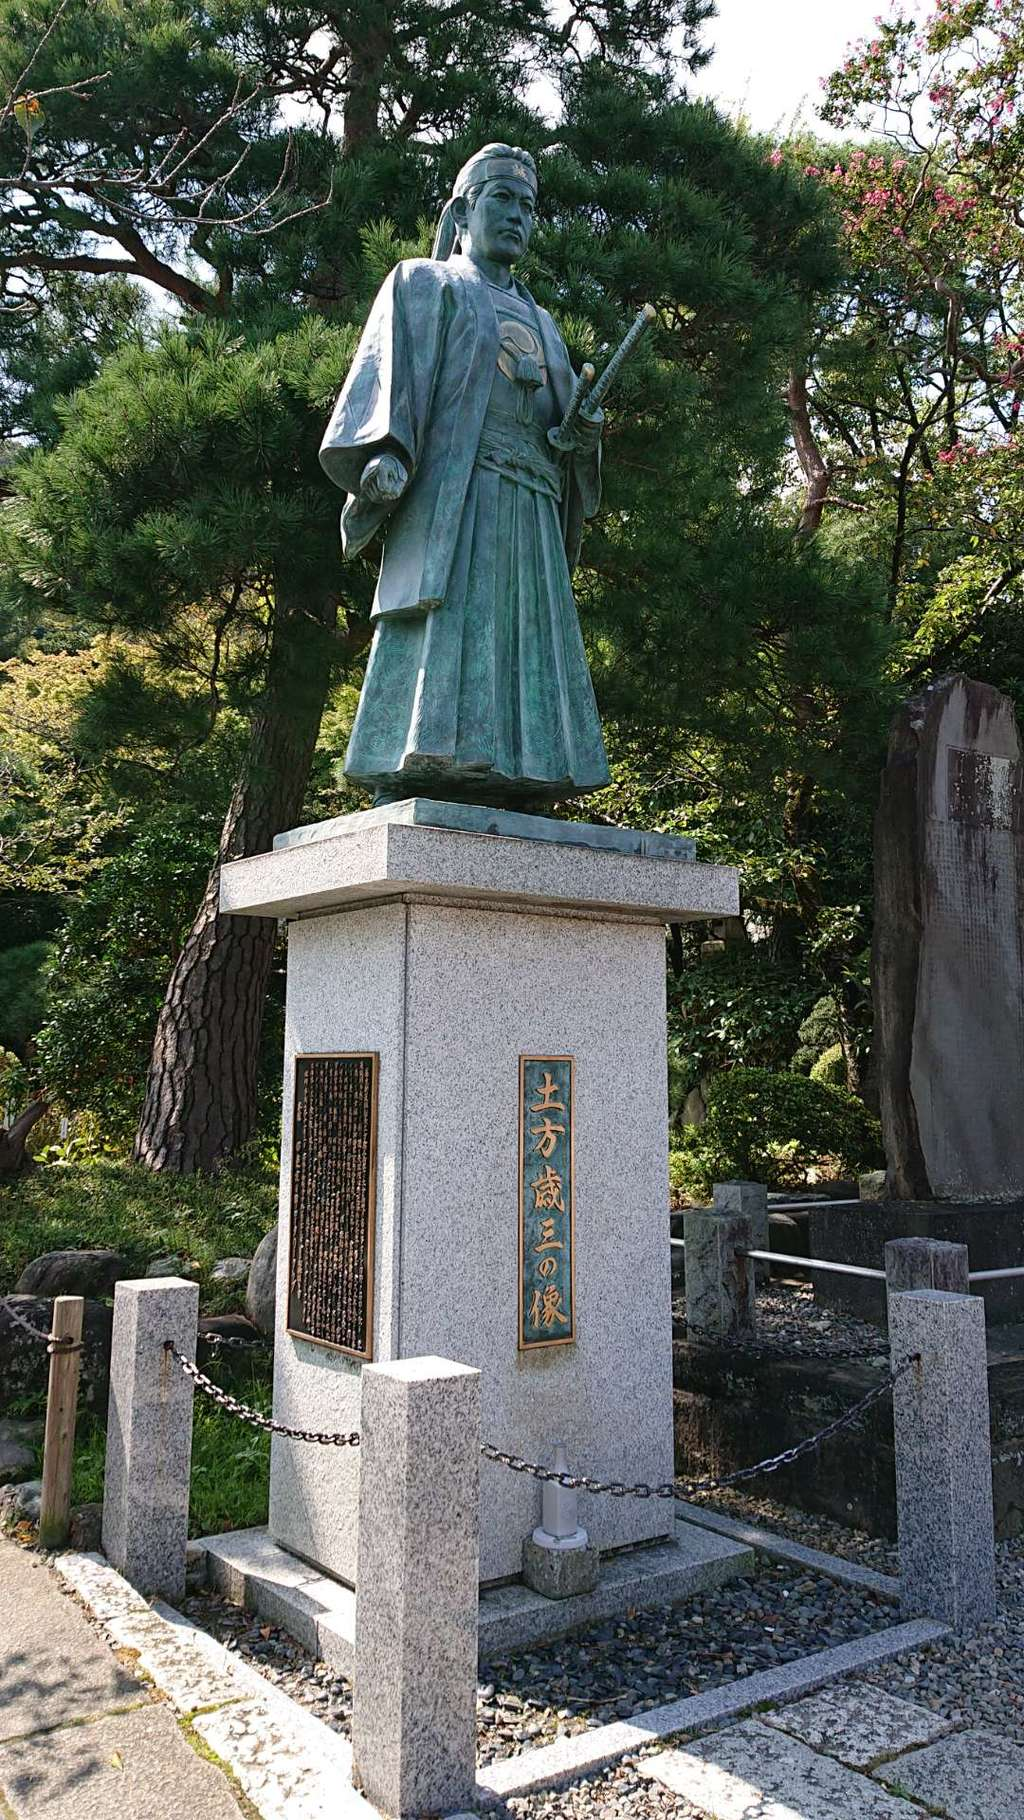 金剛寺(高幡不動尊)の像